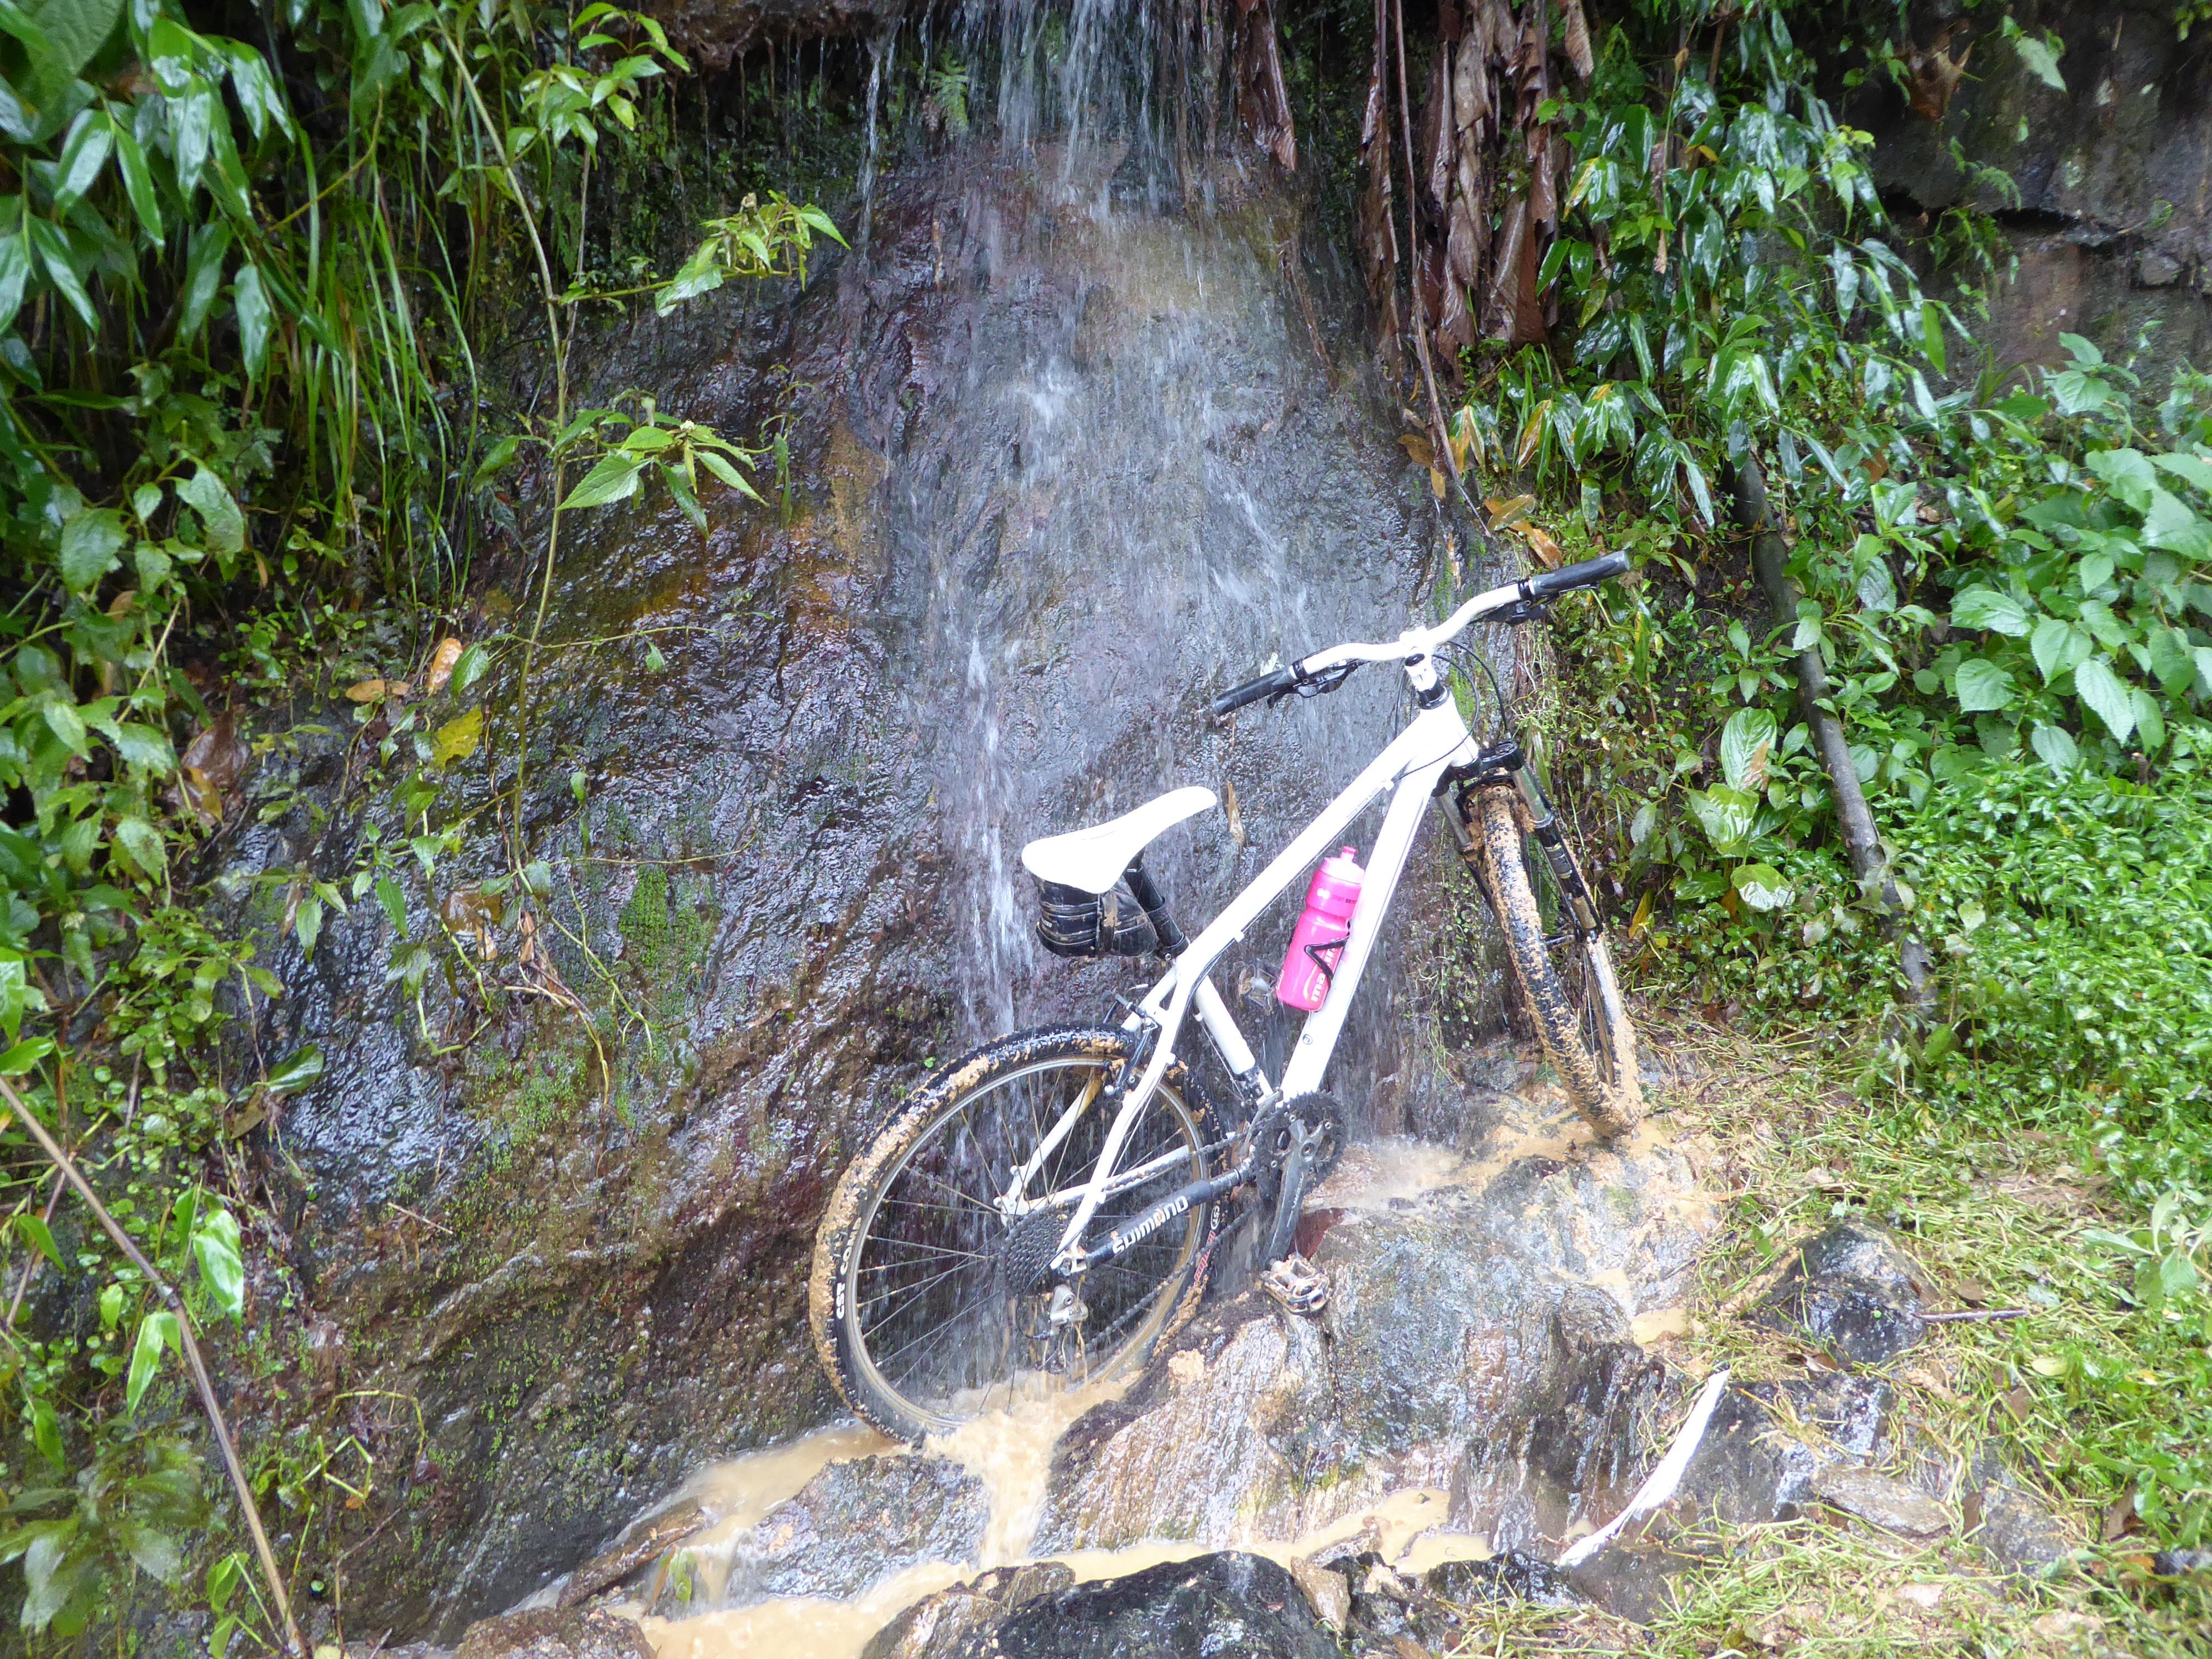 Cykelvask a la naturel.